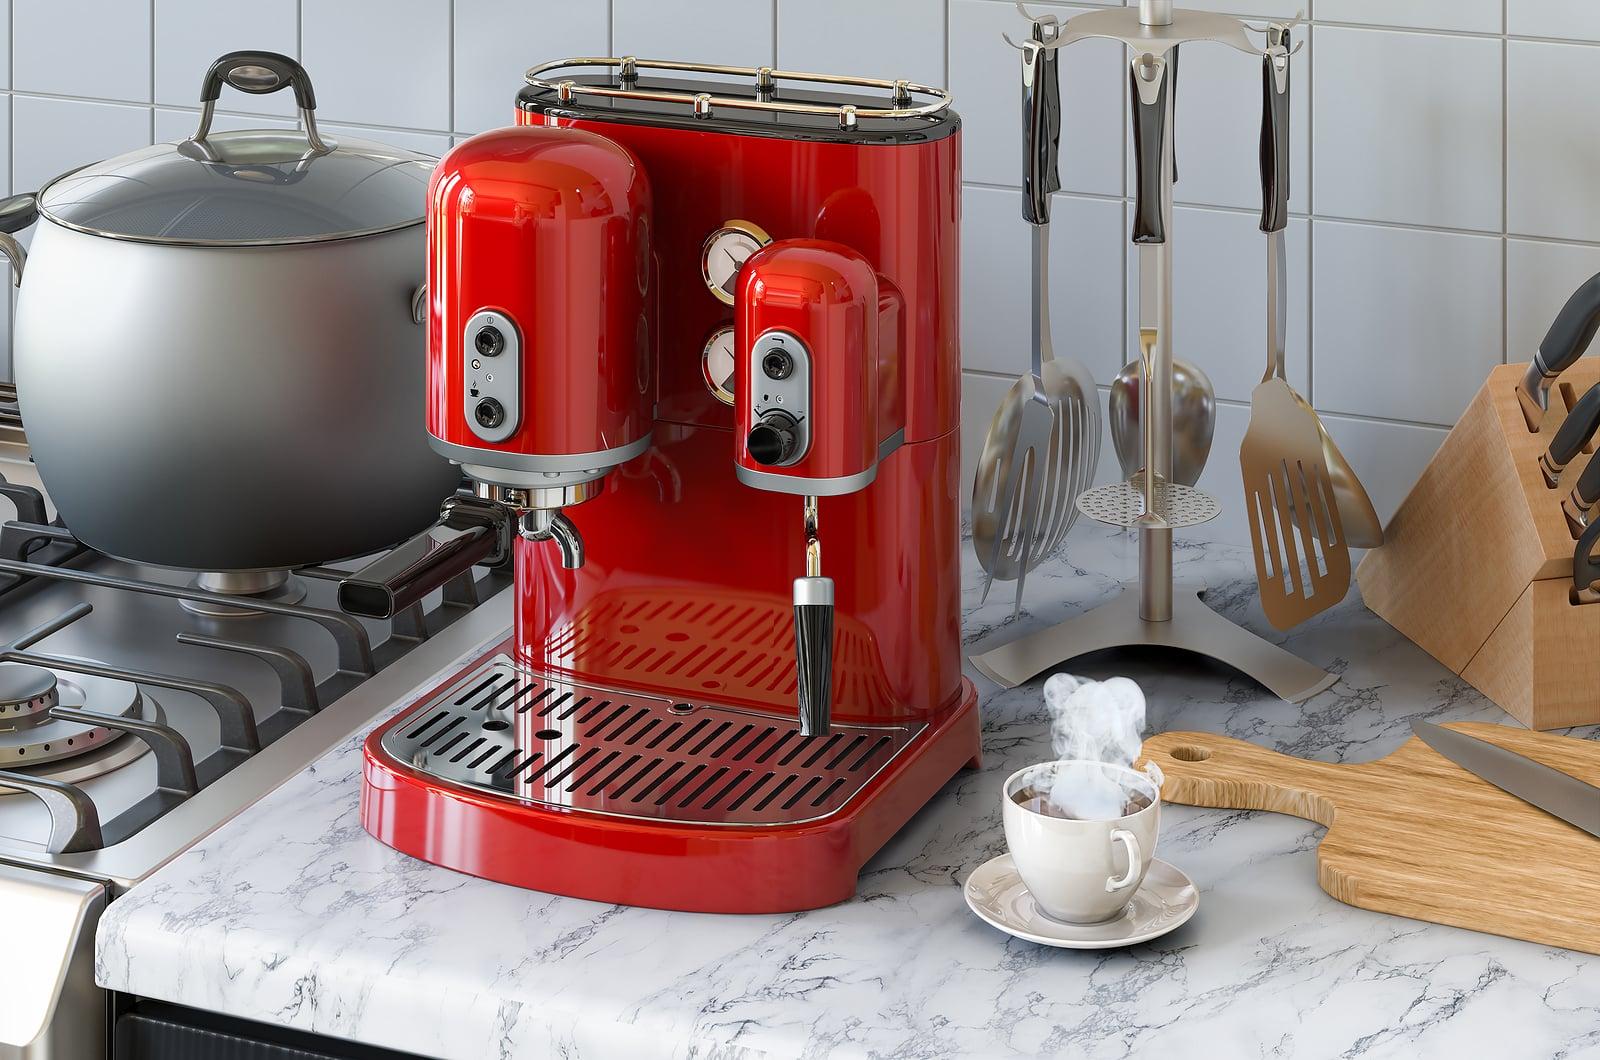 Coffee and espresso can affect gut health- espresso machine on kitchen counter